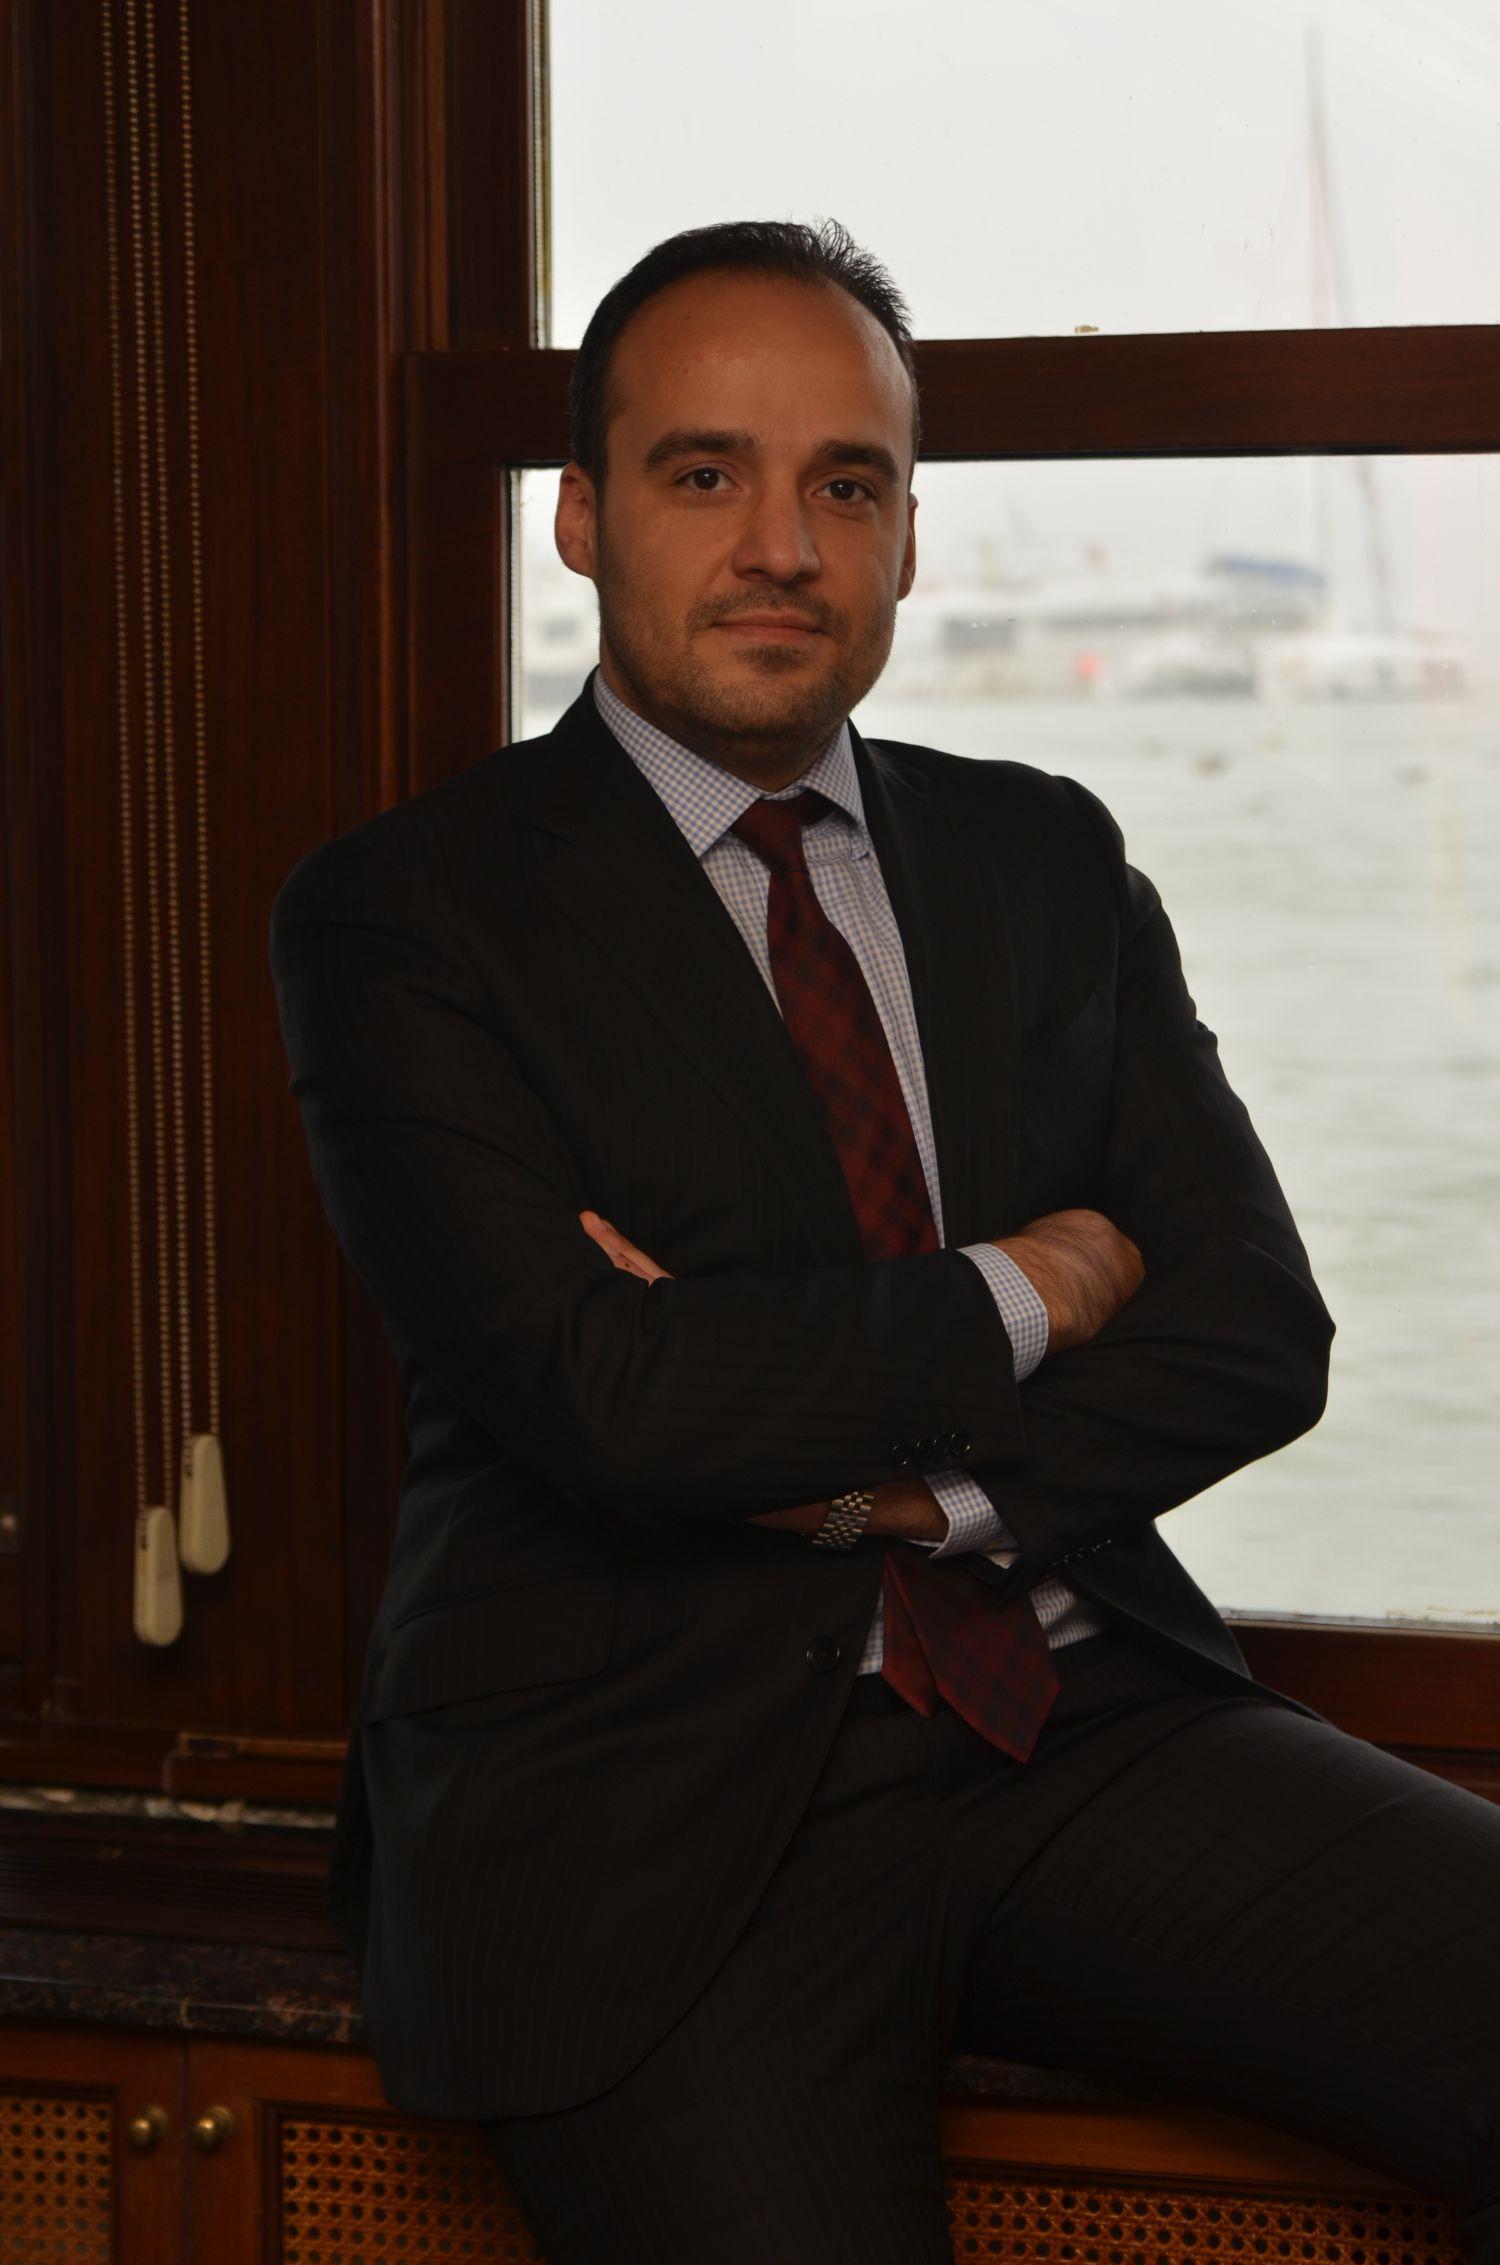 Eryap CEO su Emrullah Eruslu